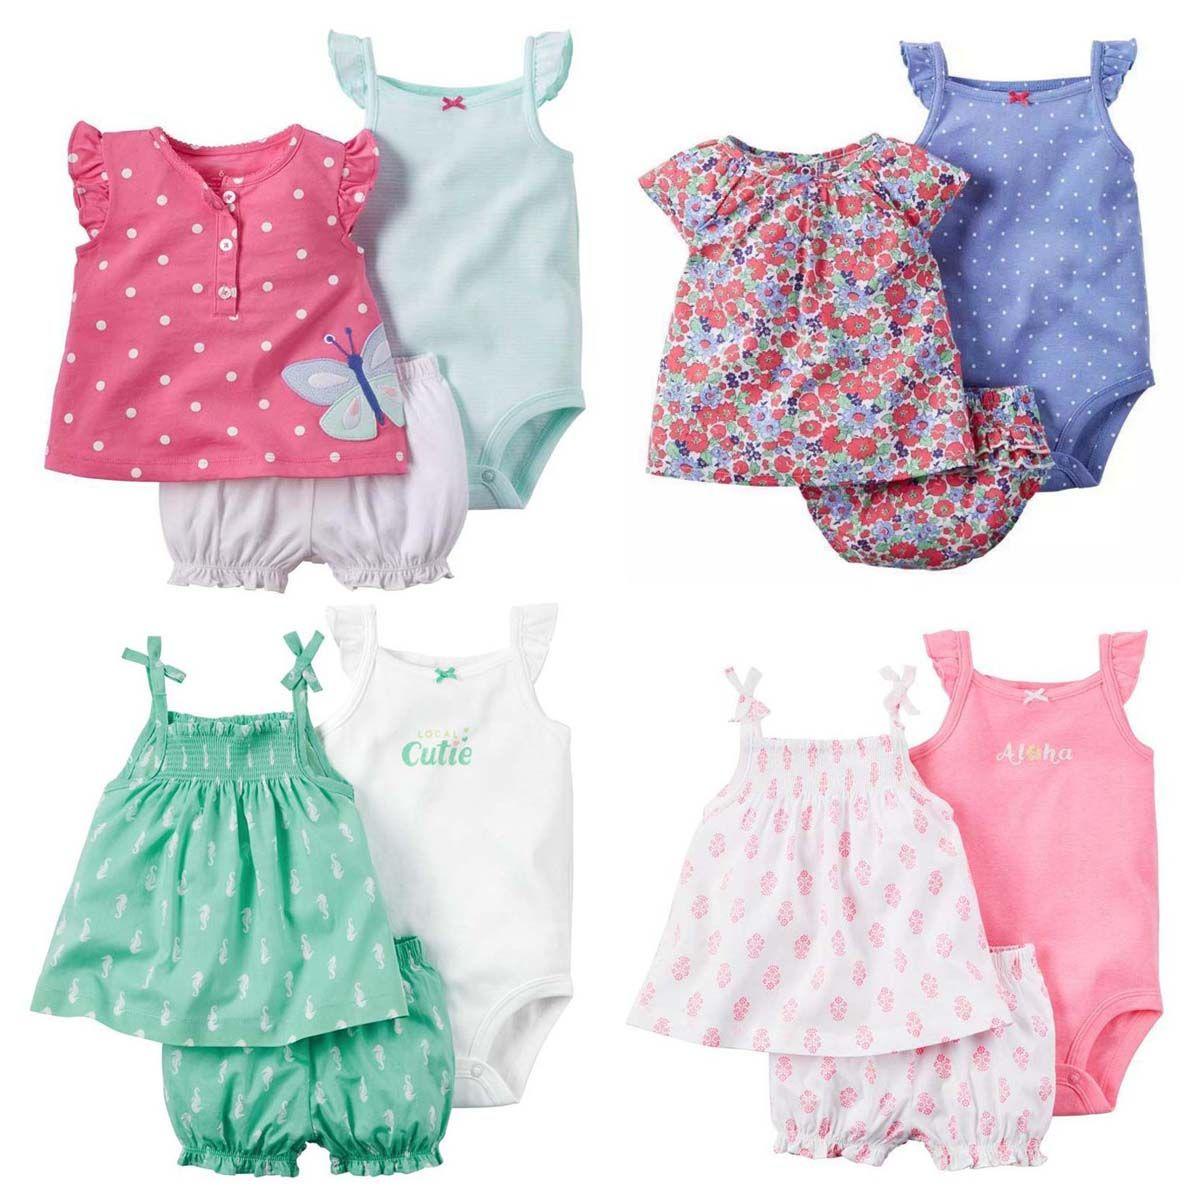 6f757f60d6e3 summer bebes baby girl clothes Condole belt set dresses kids newborn ...